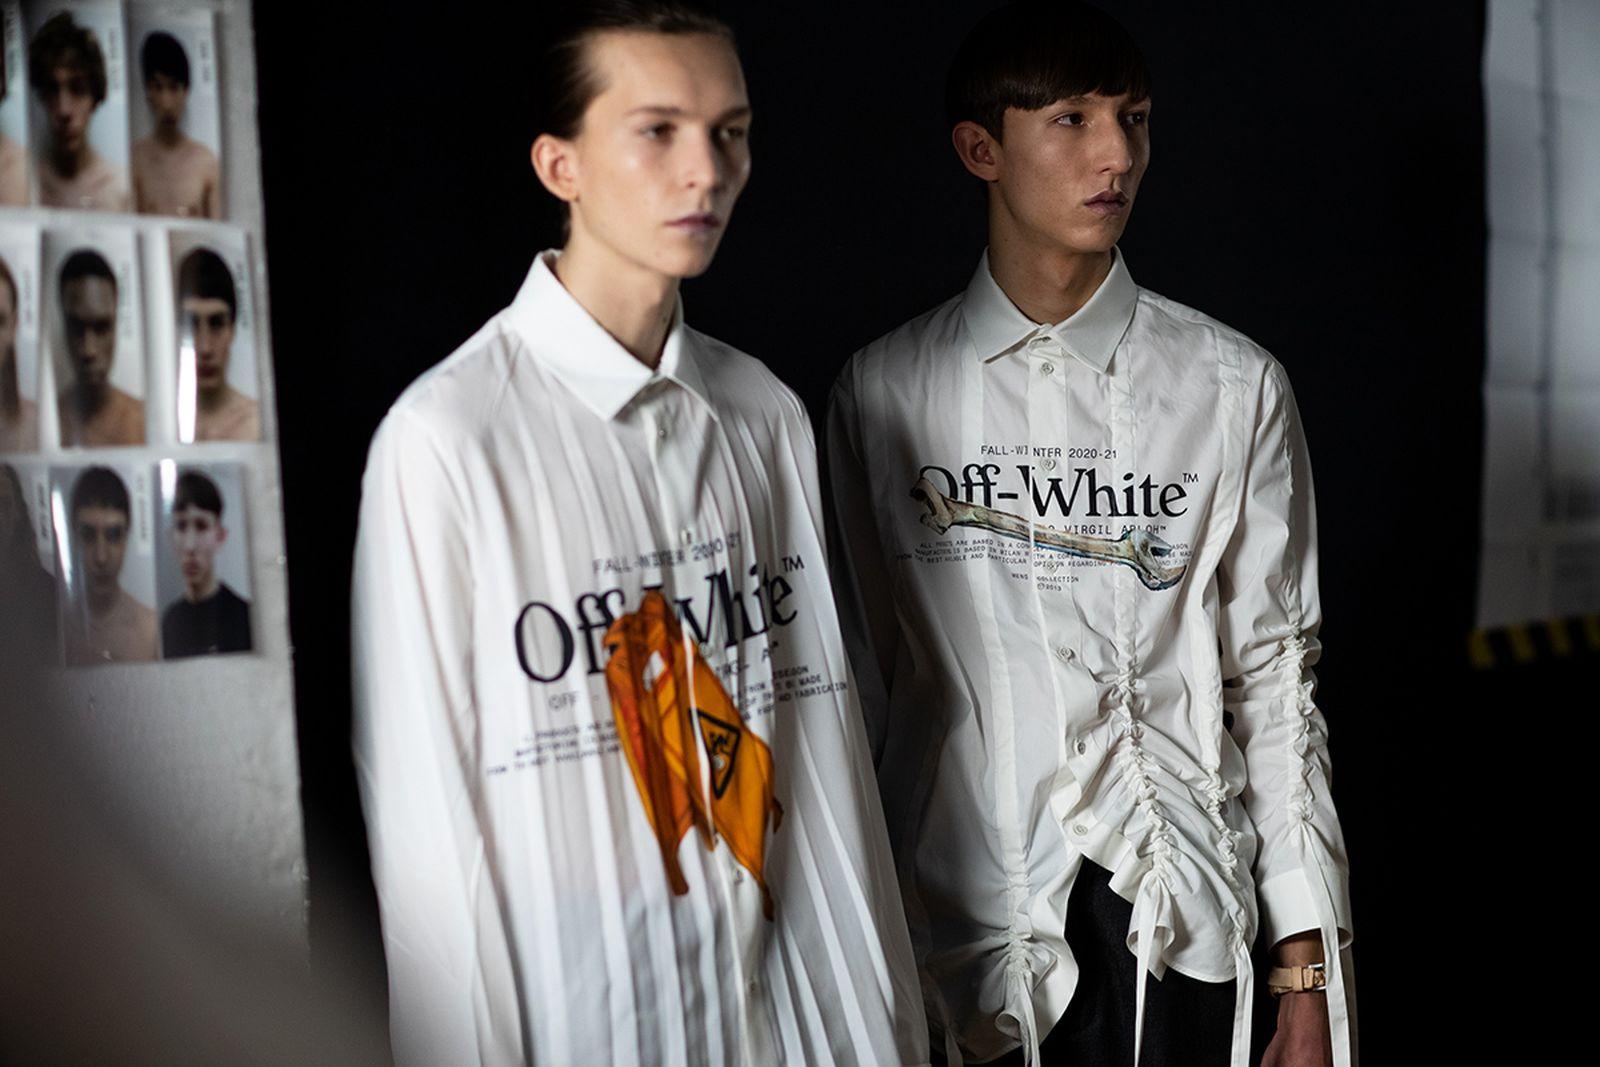 lyst-2019-q4-off-white-01